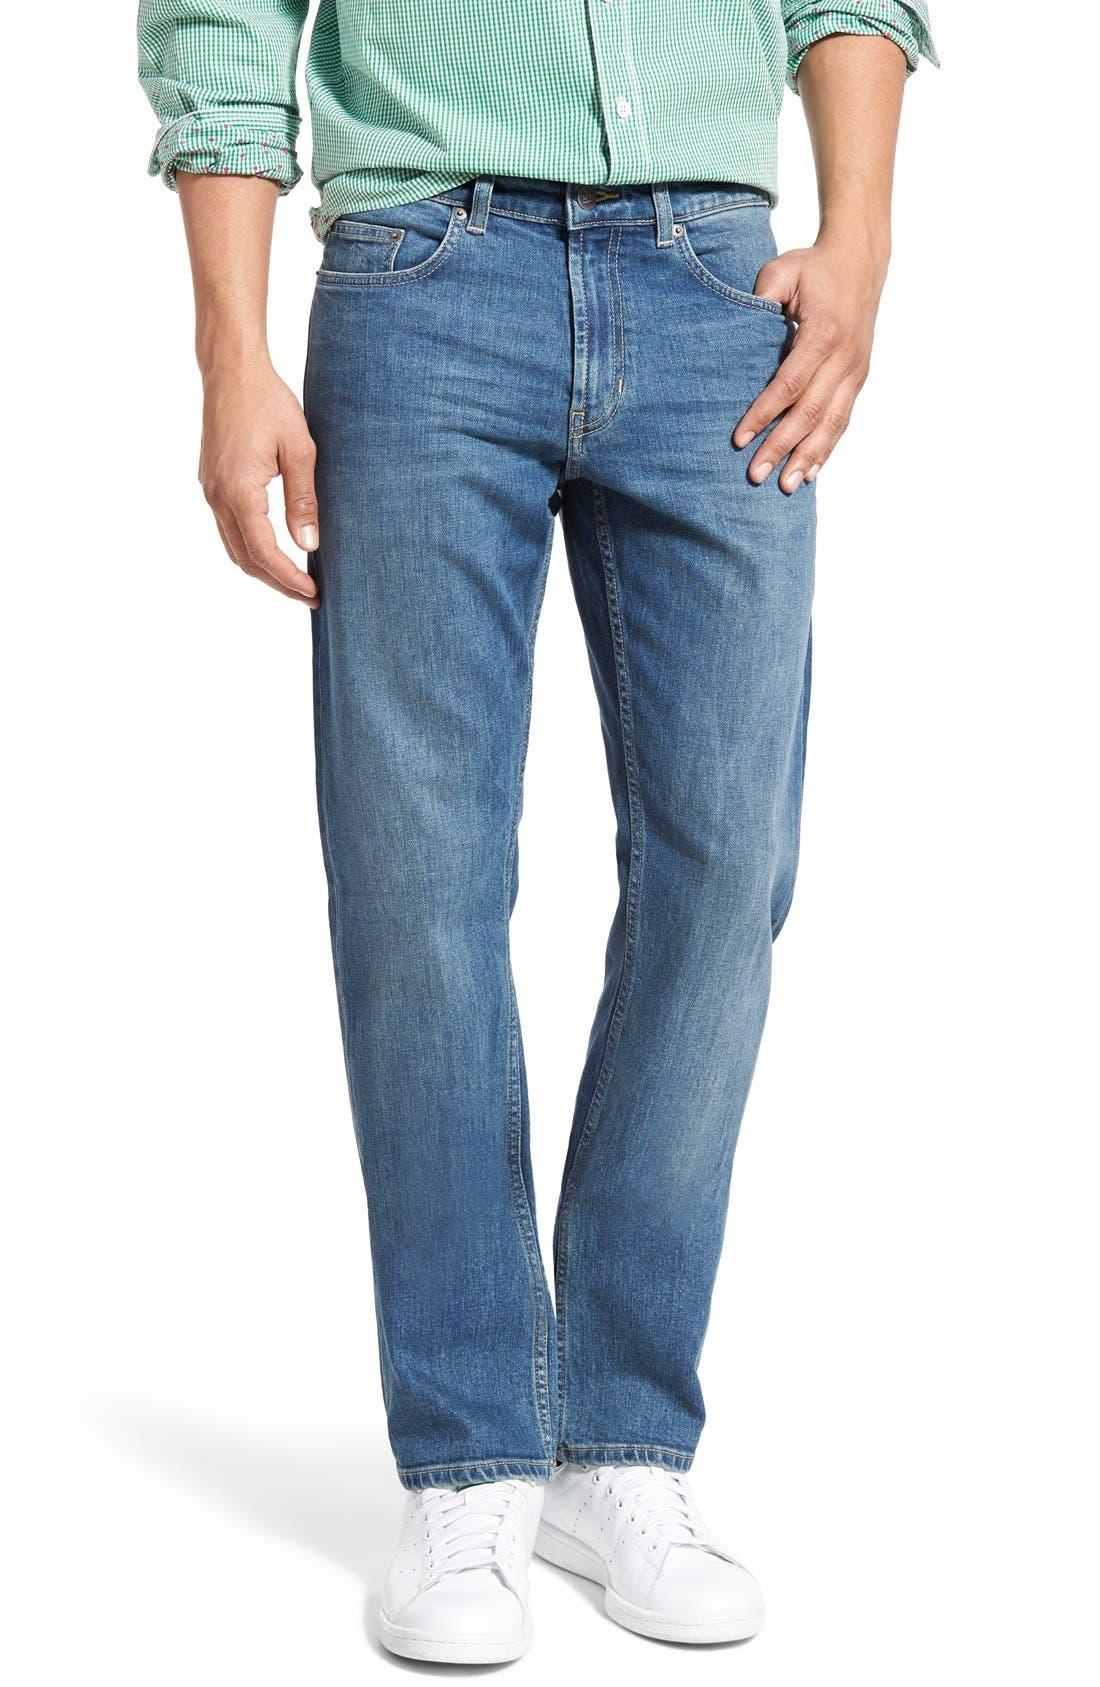 'Nicholls' Regular Fit Straight Leg Jeans, Main, color, DENIM